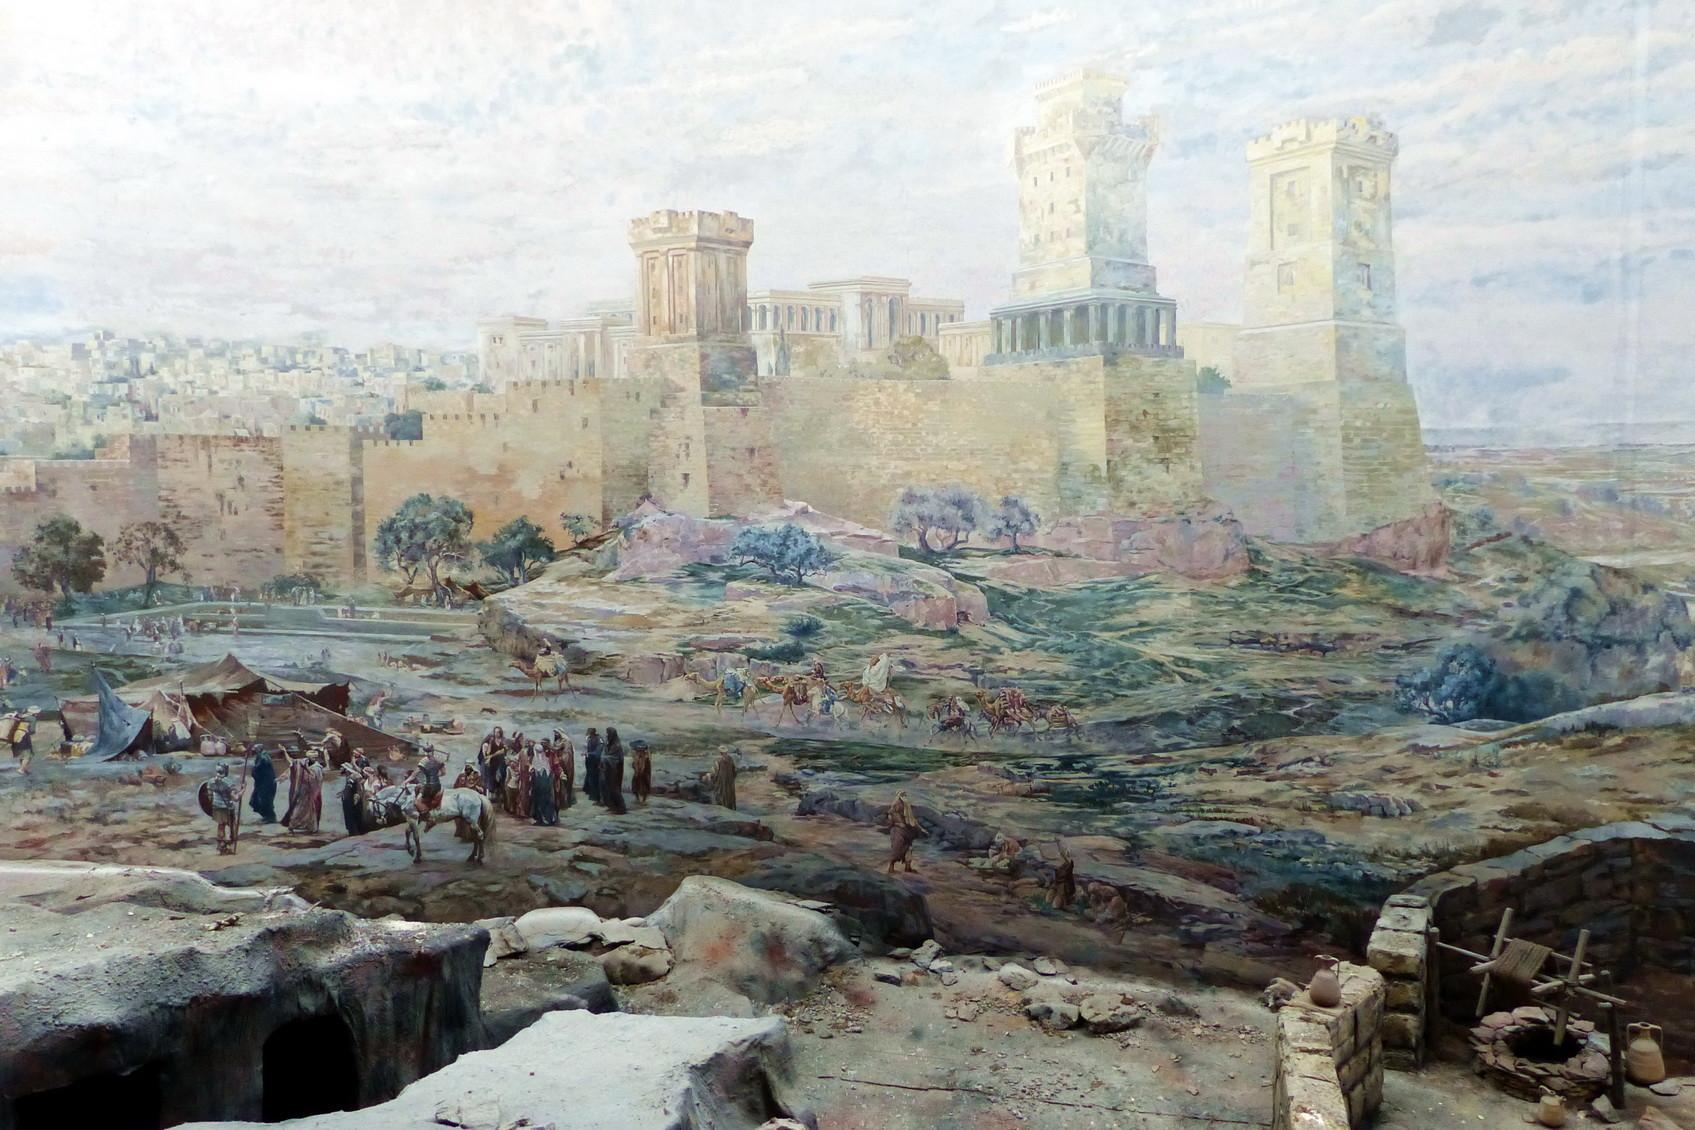 Motiv 8 - Tempelberg Zion